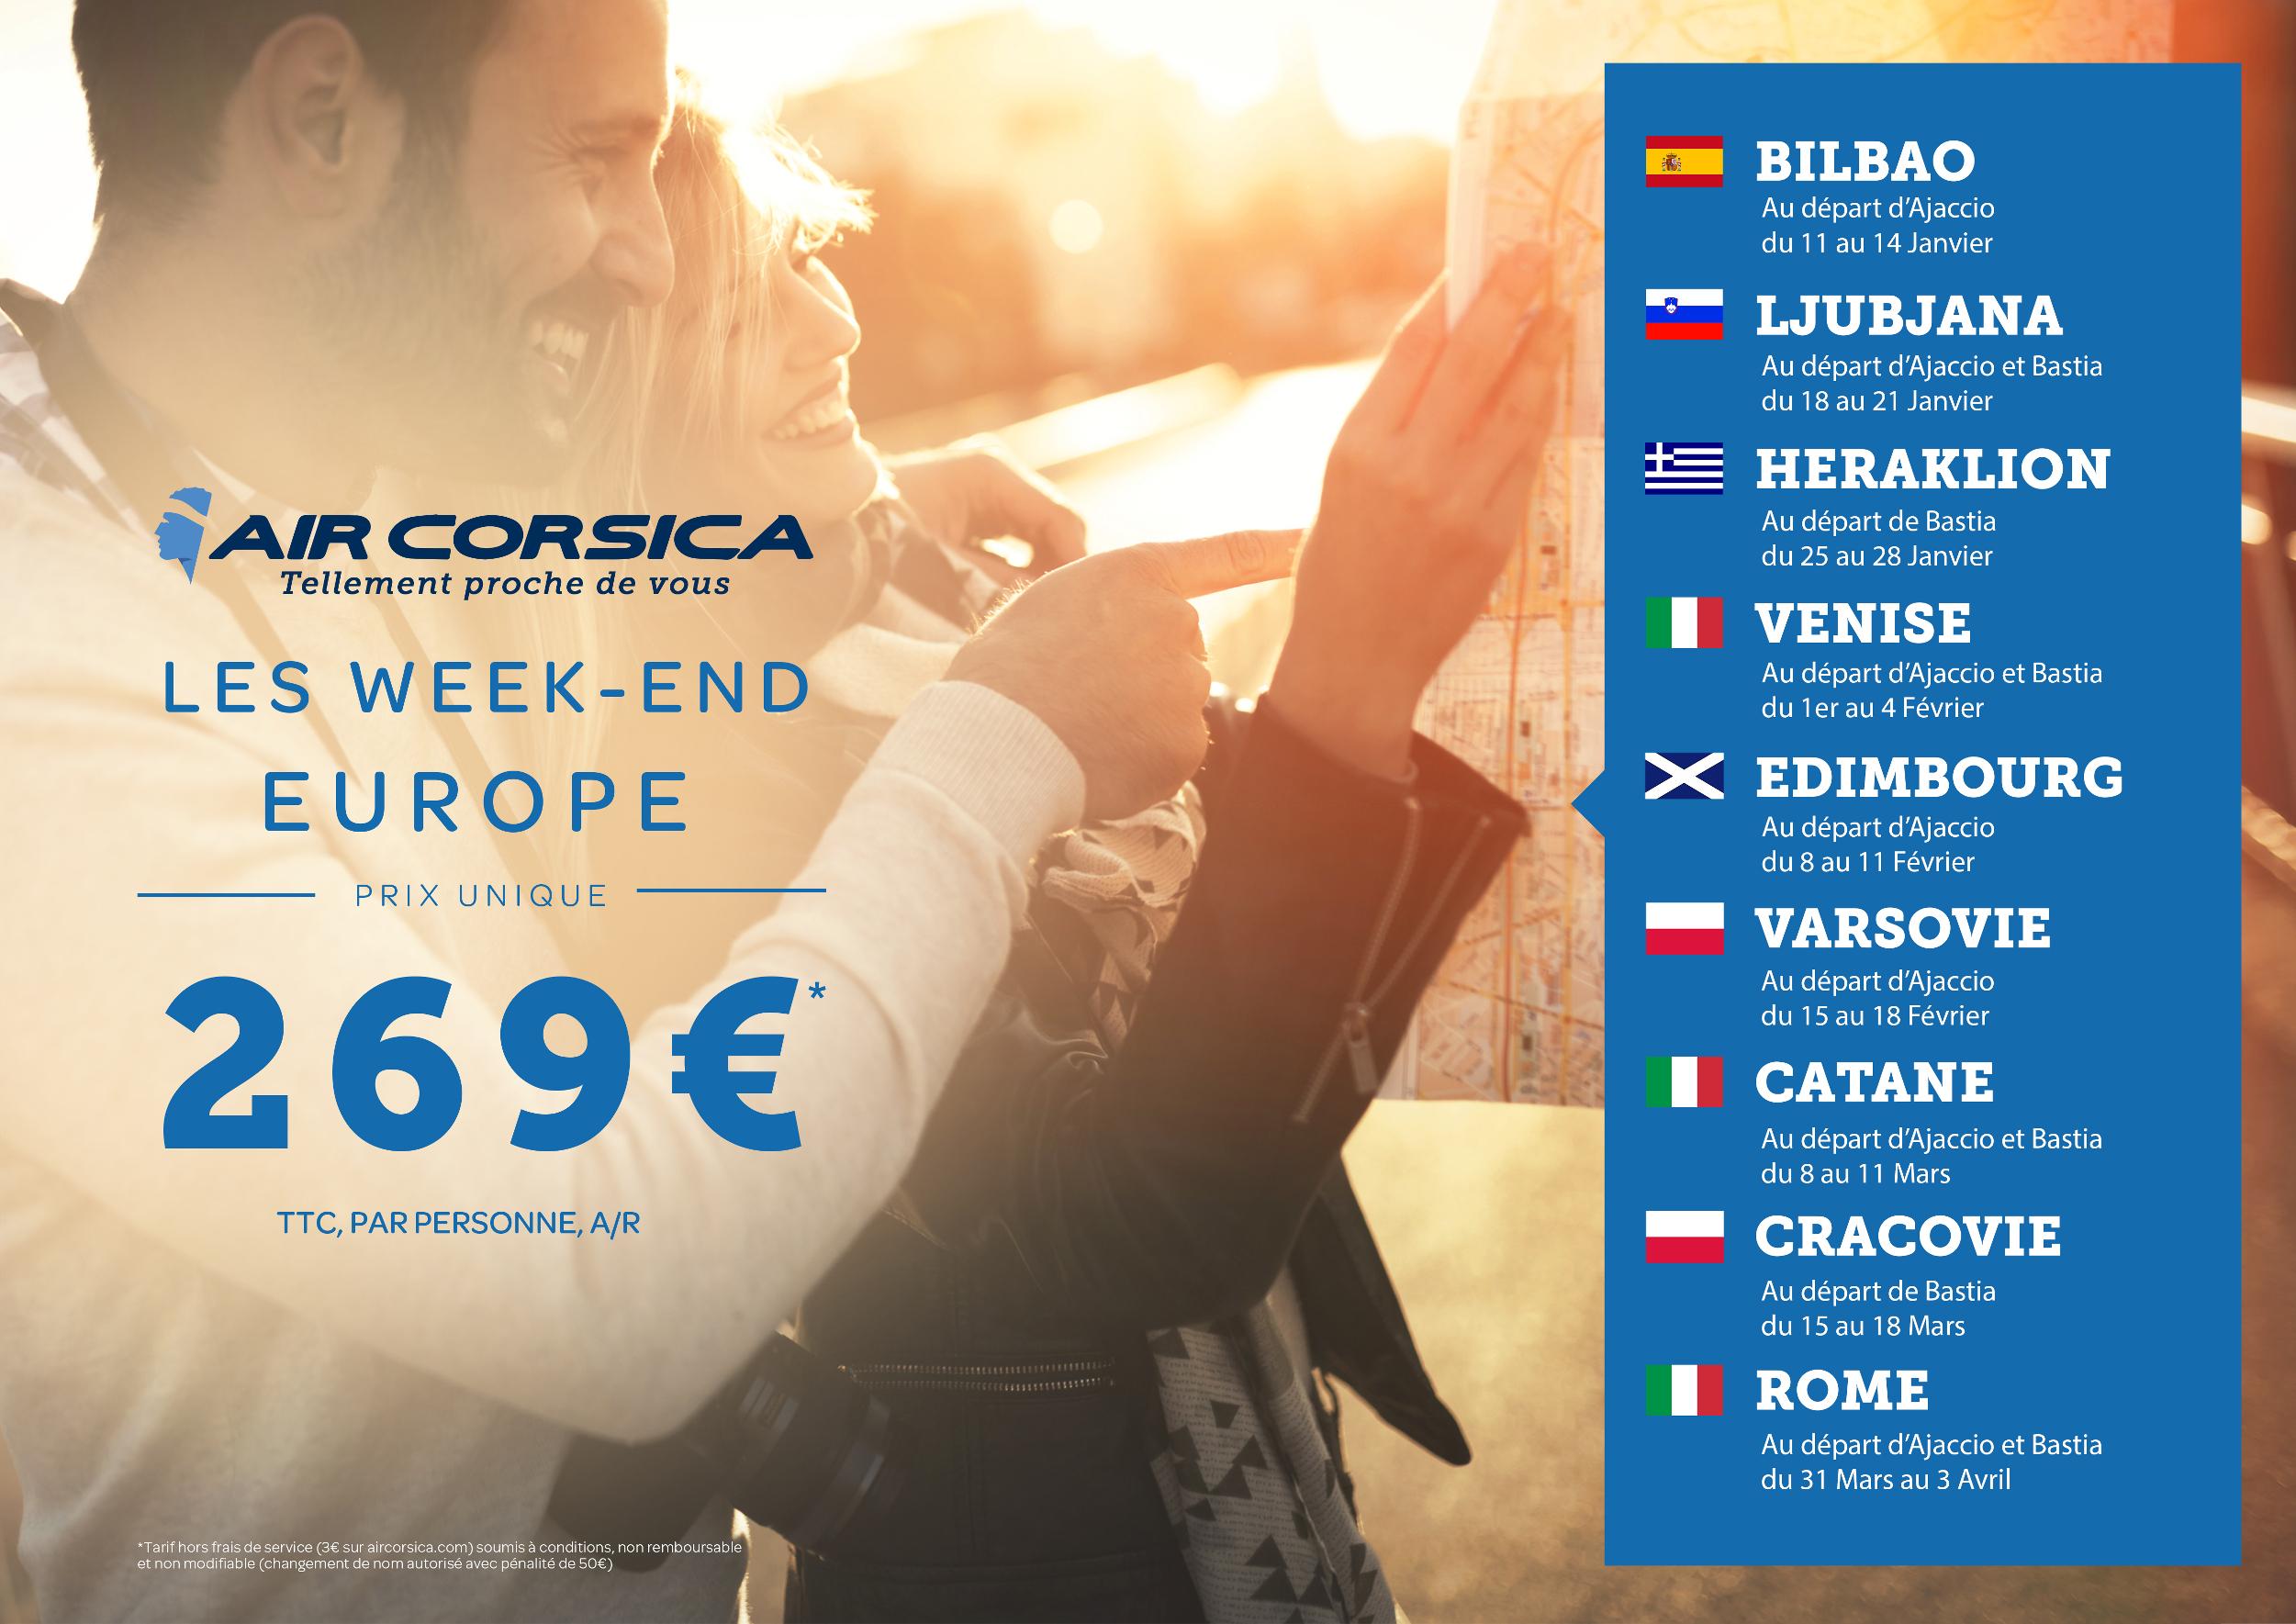 Air Corsica : Europe nous voilà !